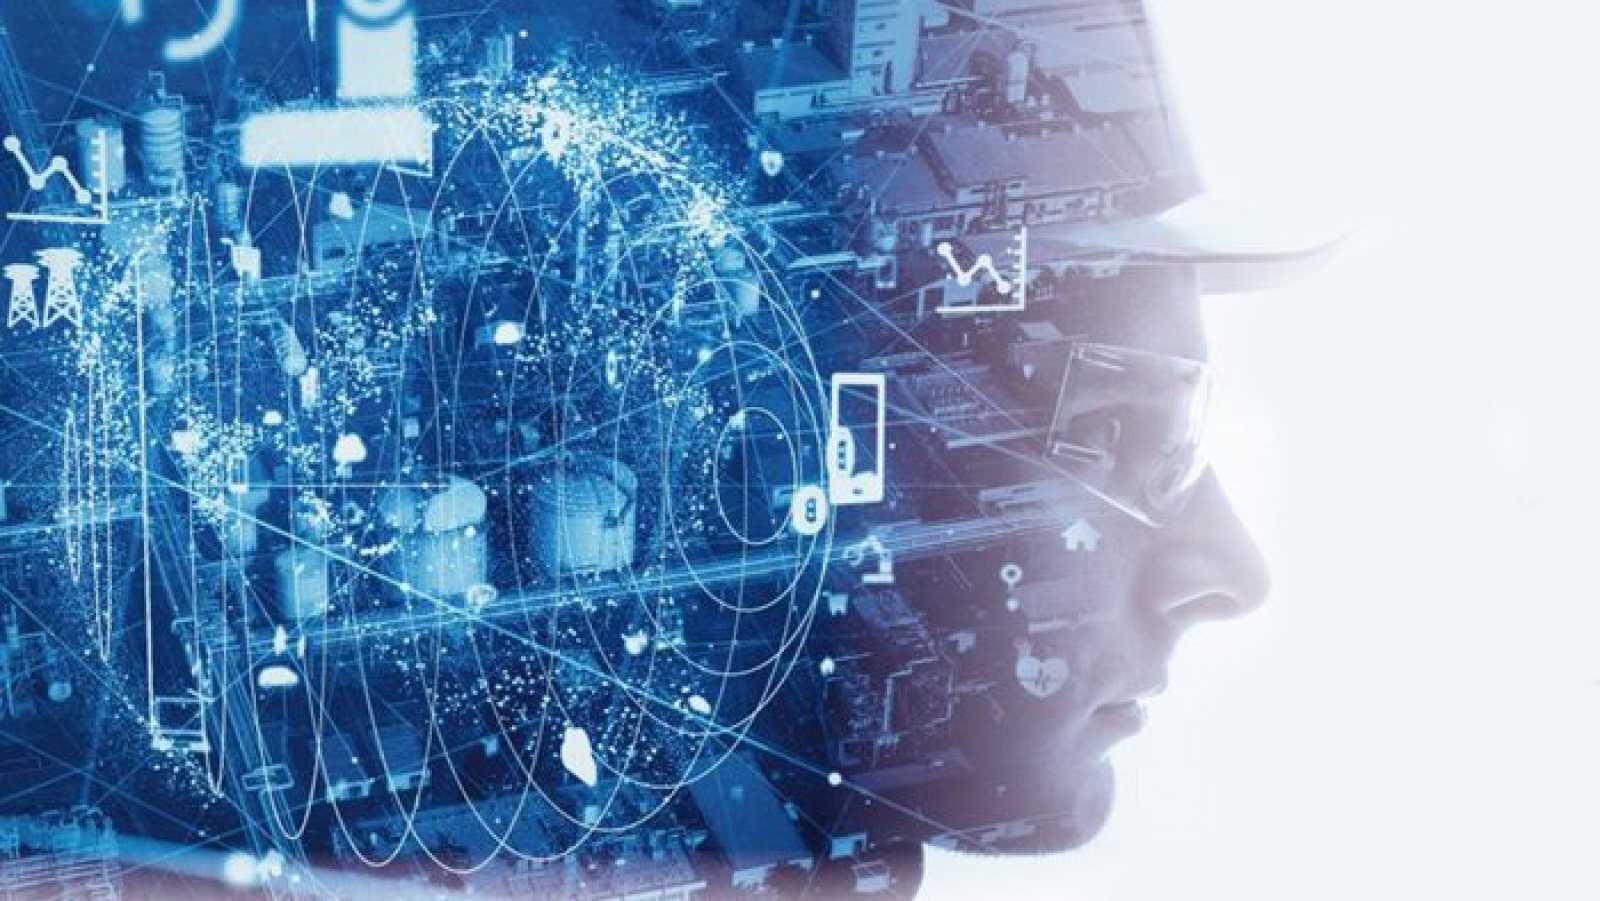 A golpe de bit - Industria digital: 4 casos de éxito en el Nunsys day - 21/09/20 - escuchar ahora